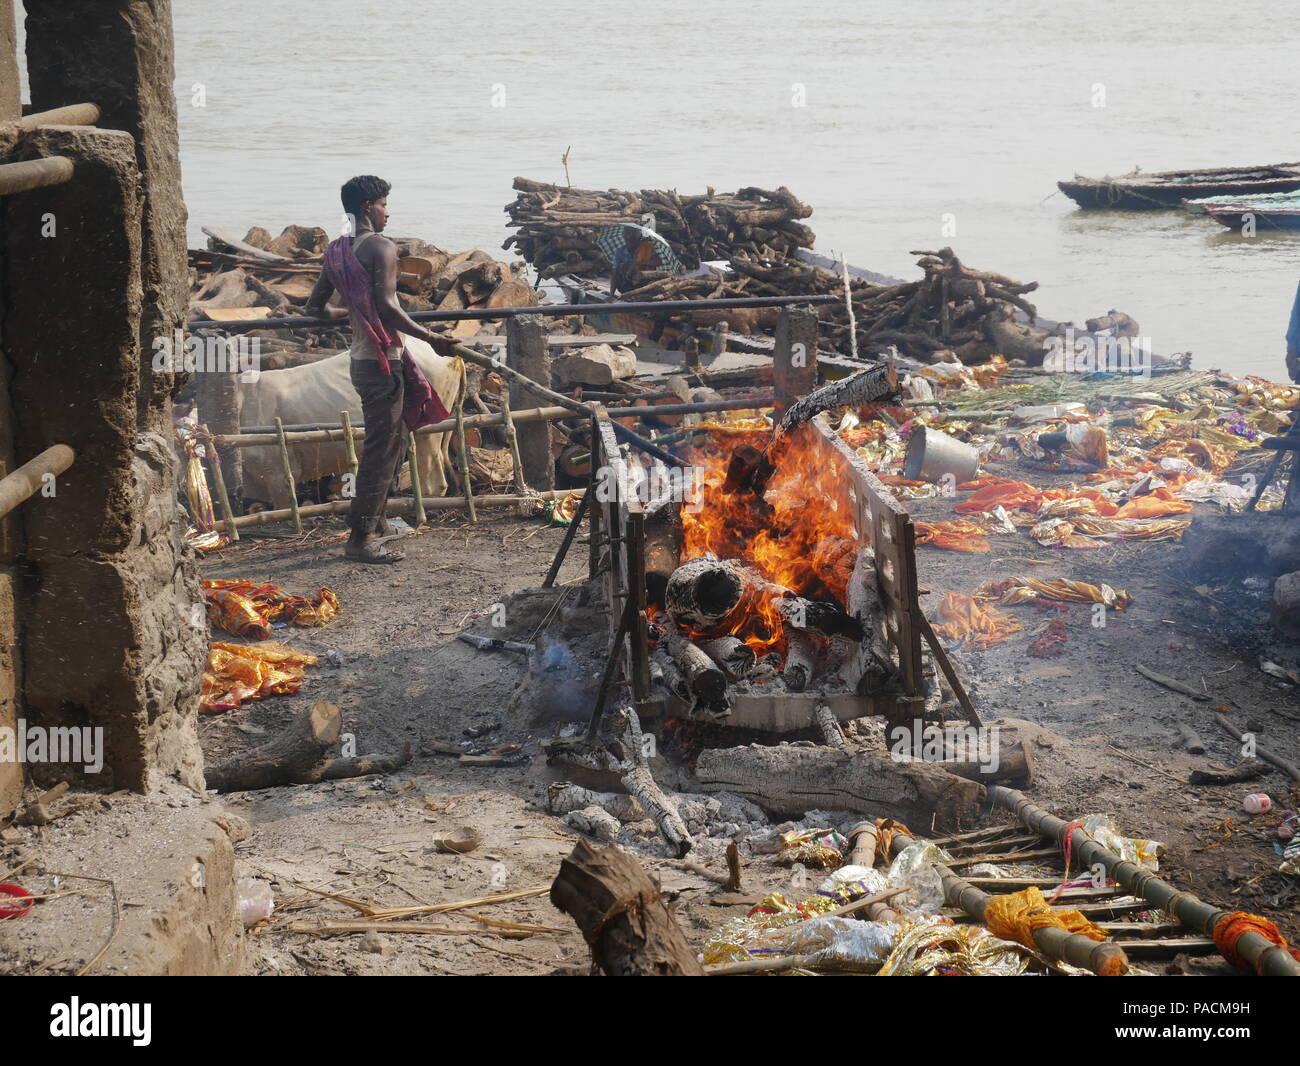 An untouchable stirs the embers of a burning body at Manakarnika Ghats, Varanasi, India. - Stock Image